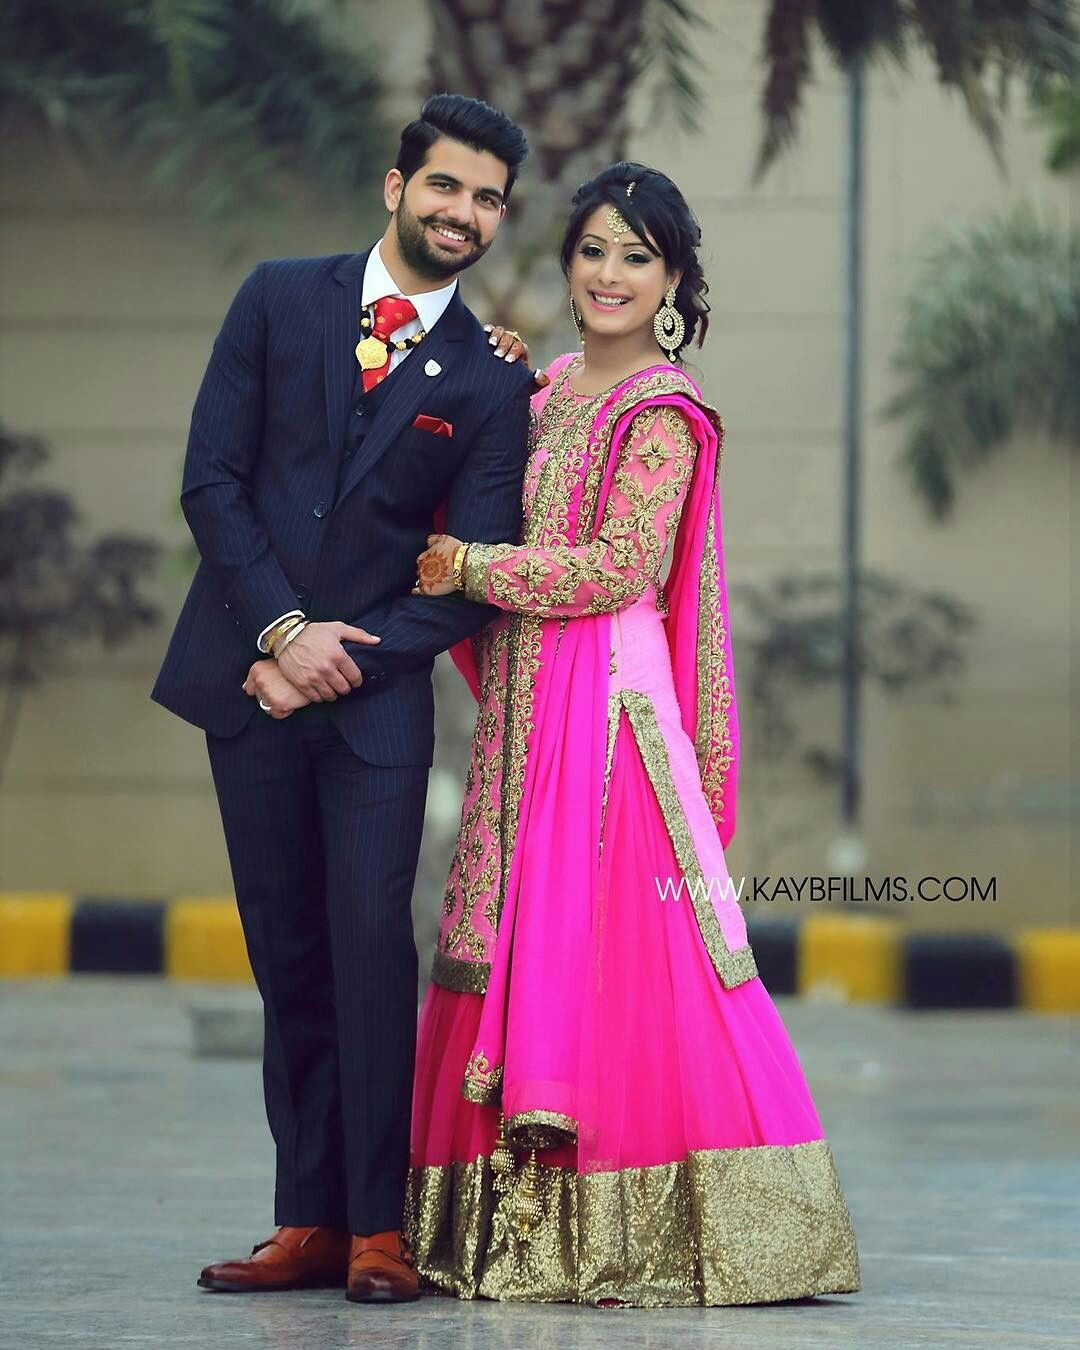 Nav jivan | Couple | Pinterest | Couples, Pose and Wedding